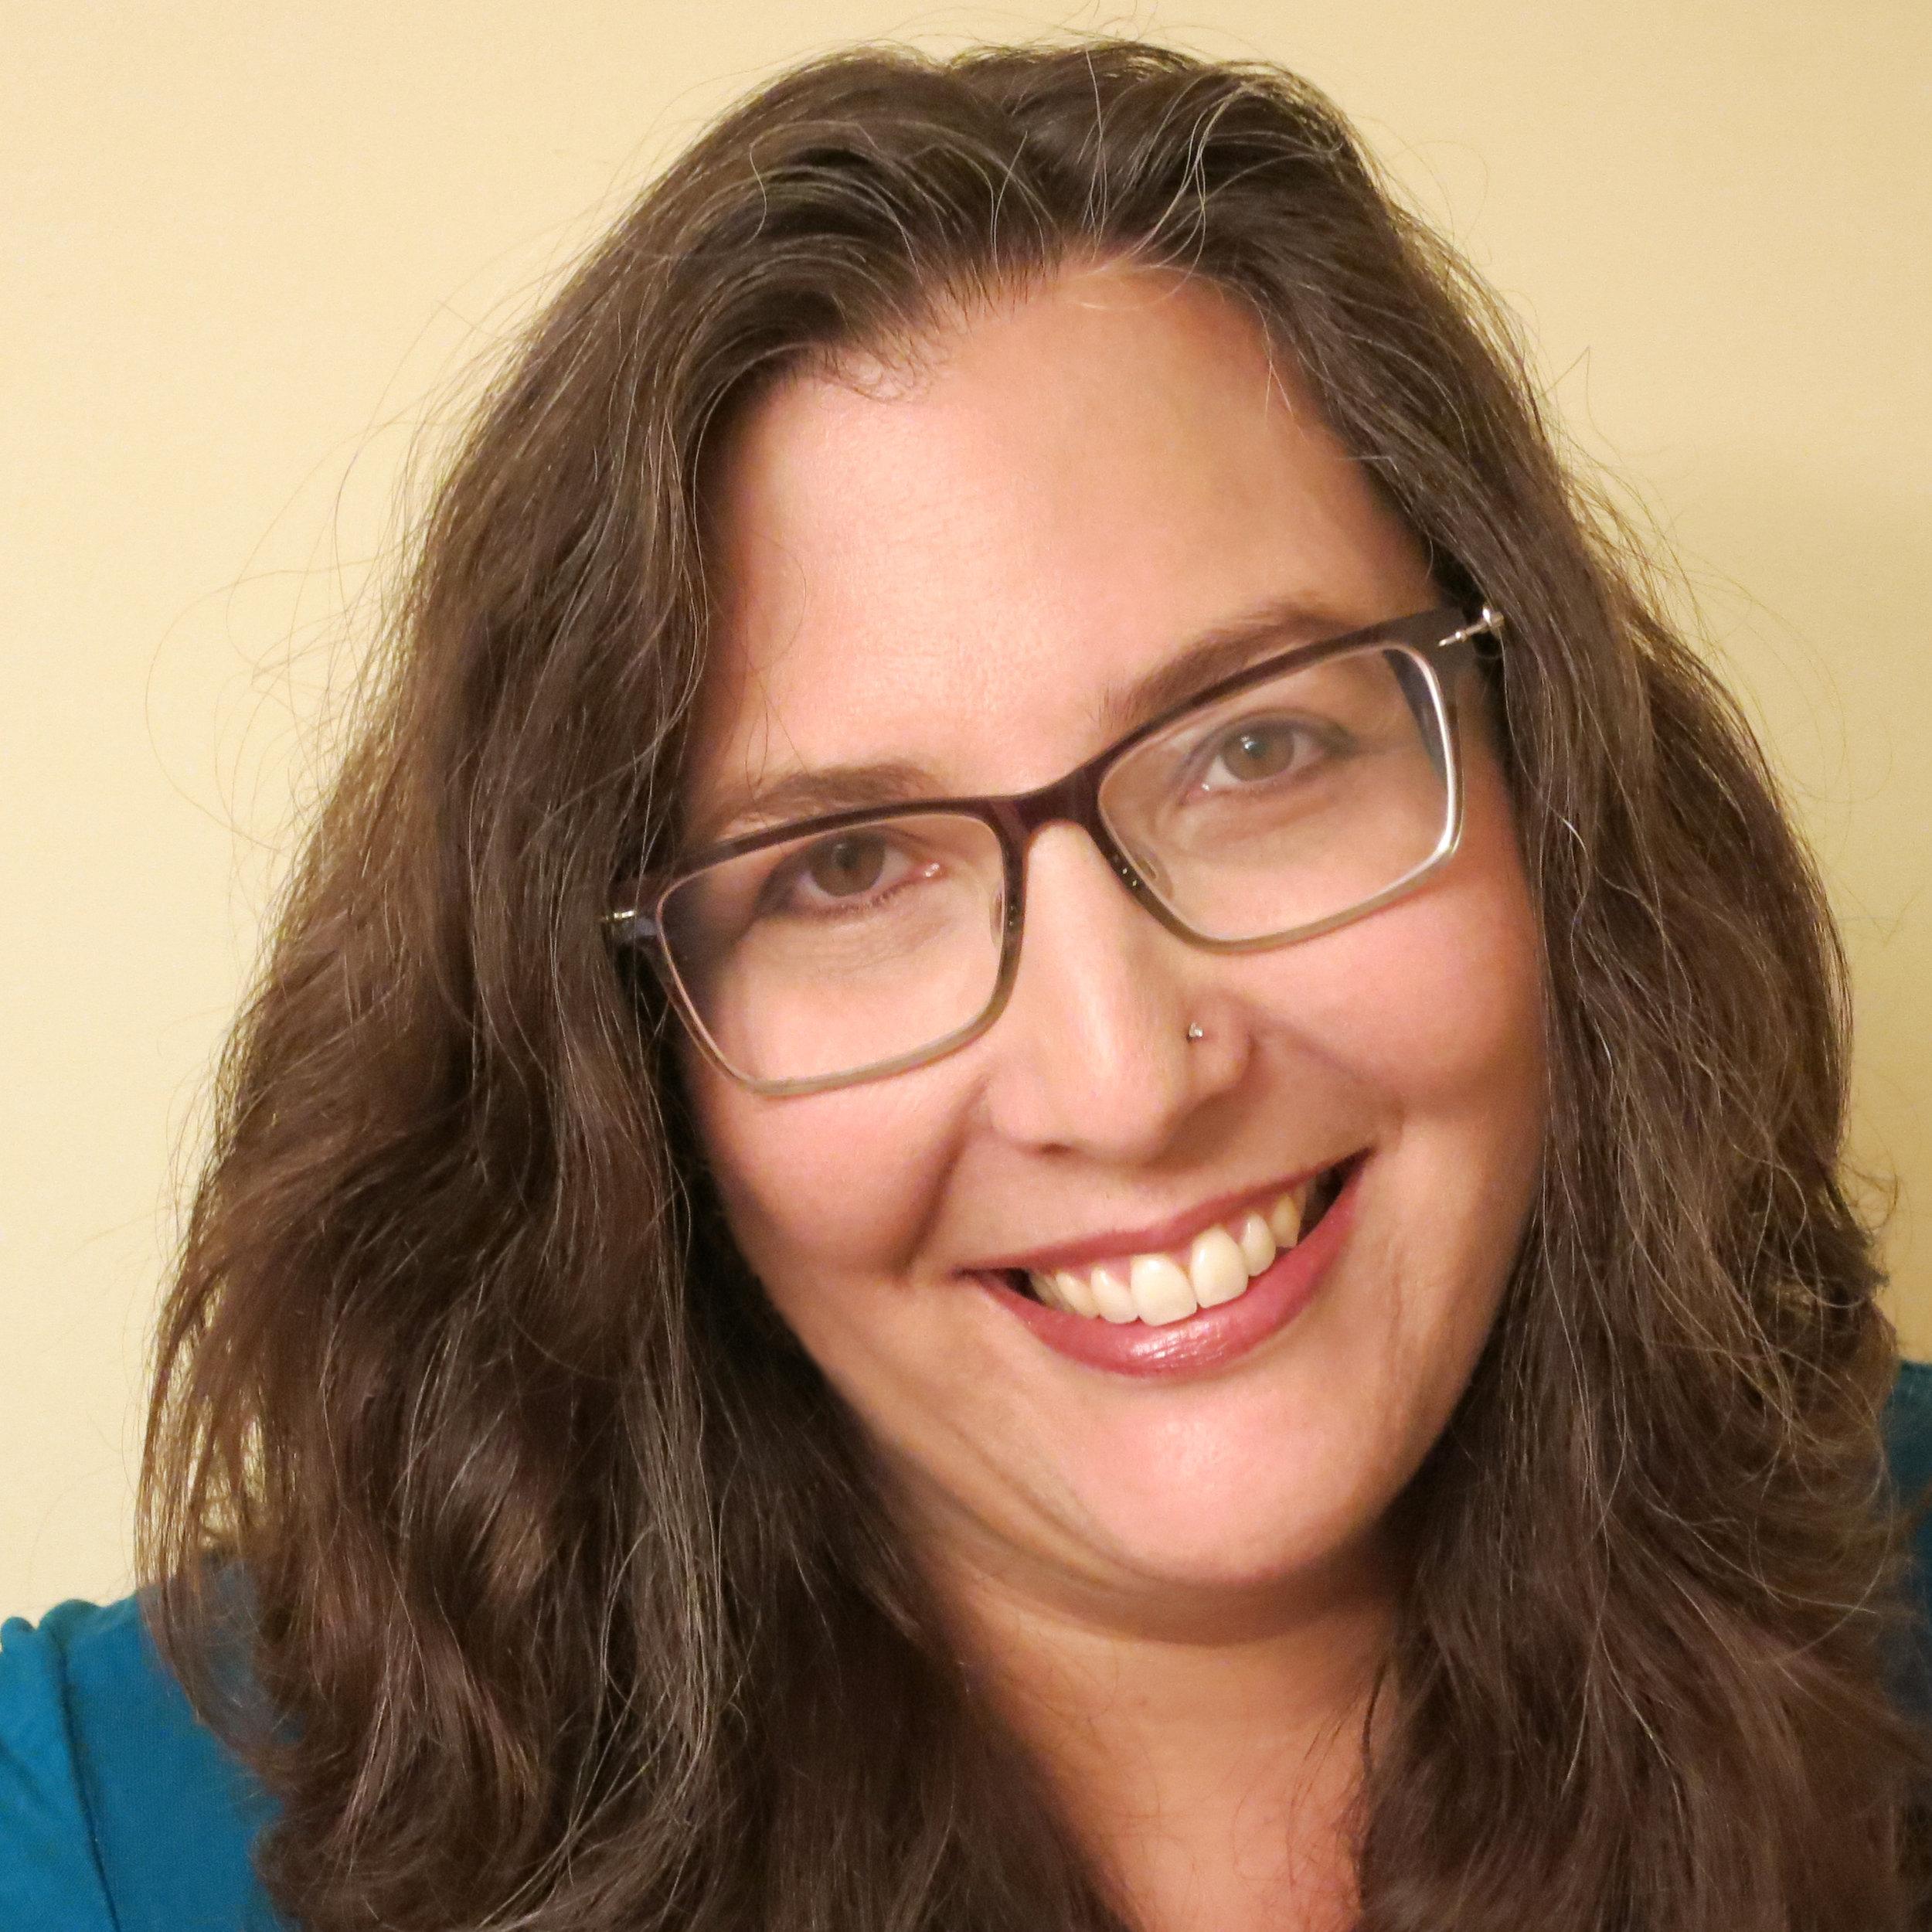 Heather Zacker   heather@heatherzacker.com   617.710.8757